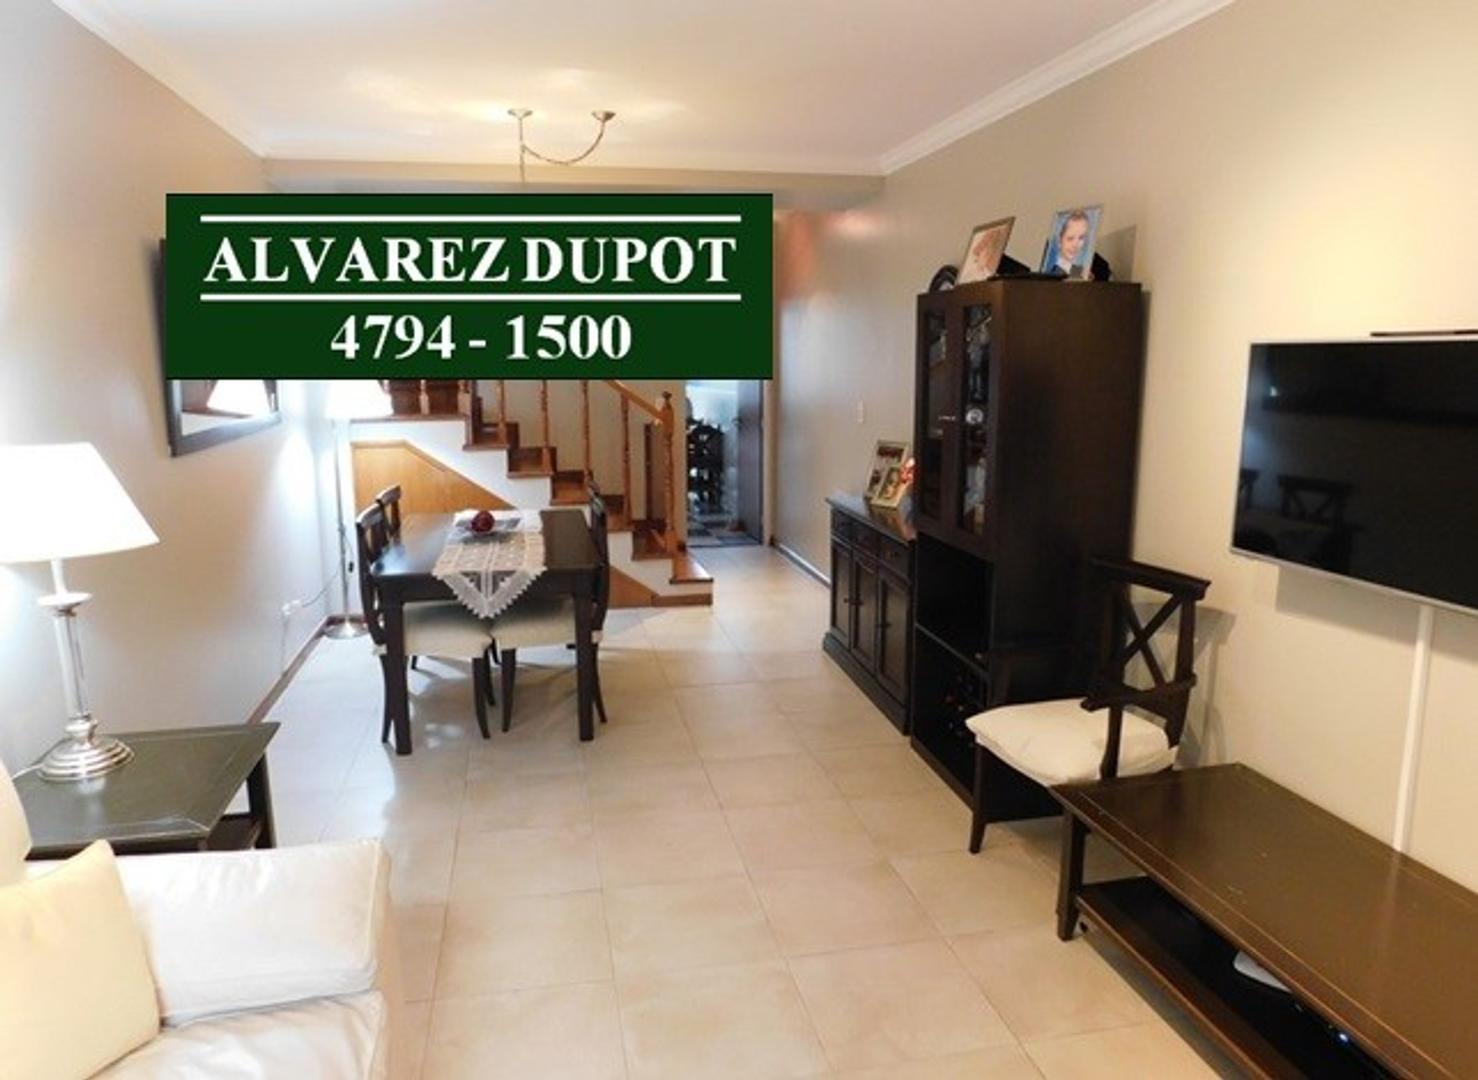 Casa - Venta - Argentina, VICENTE LÓPEZ - Avellaneda 2700